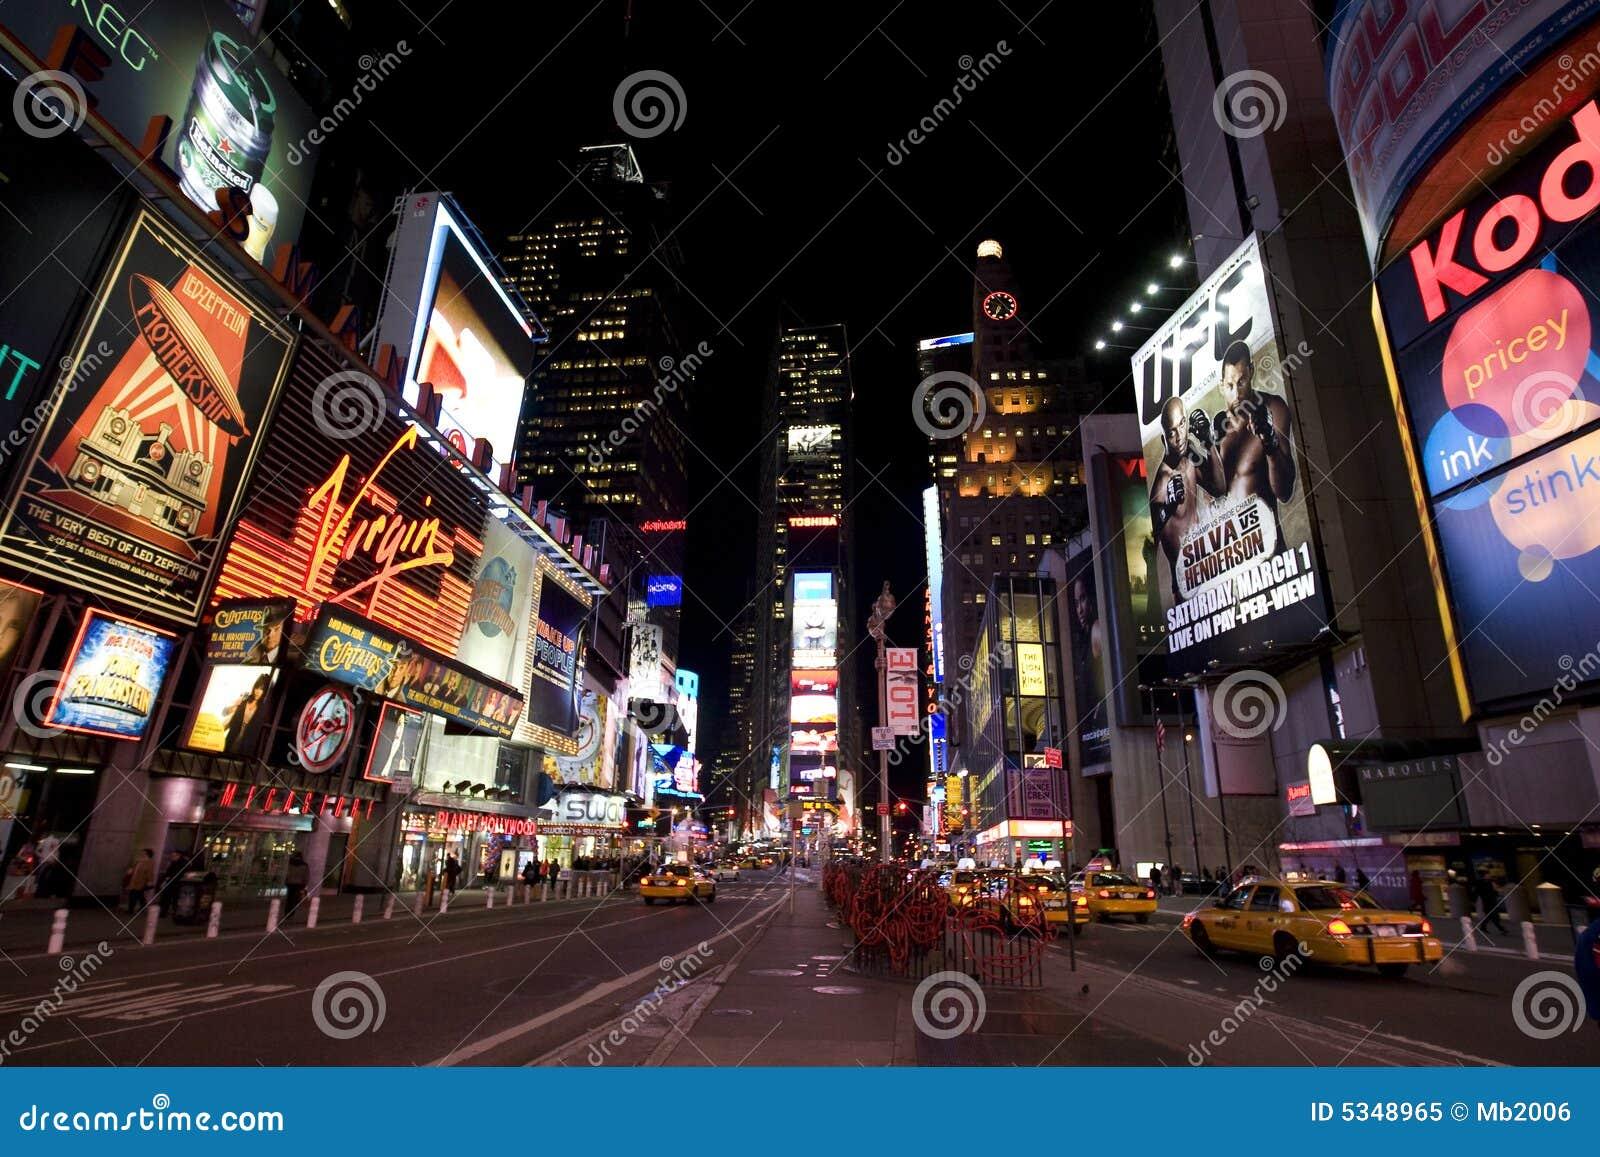 New York Broadway At Night Editorial Image Image 5348965